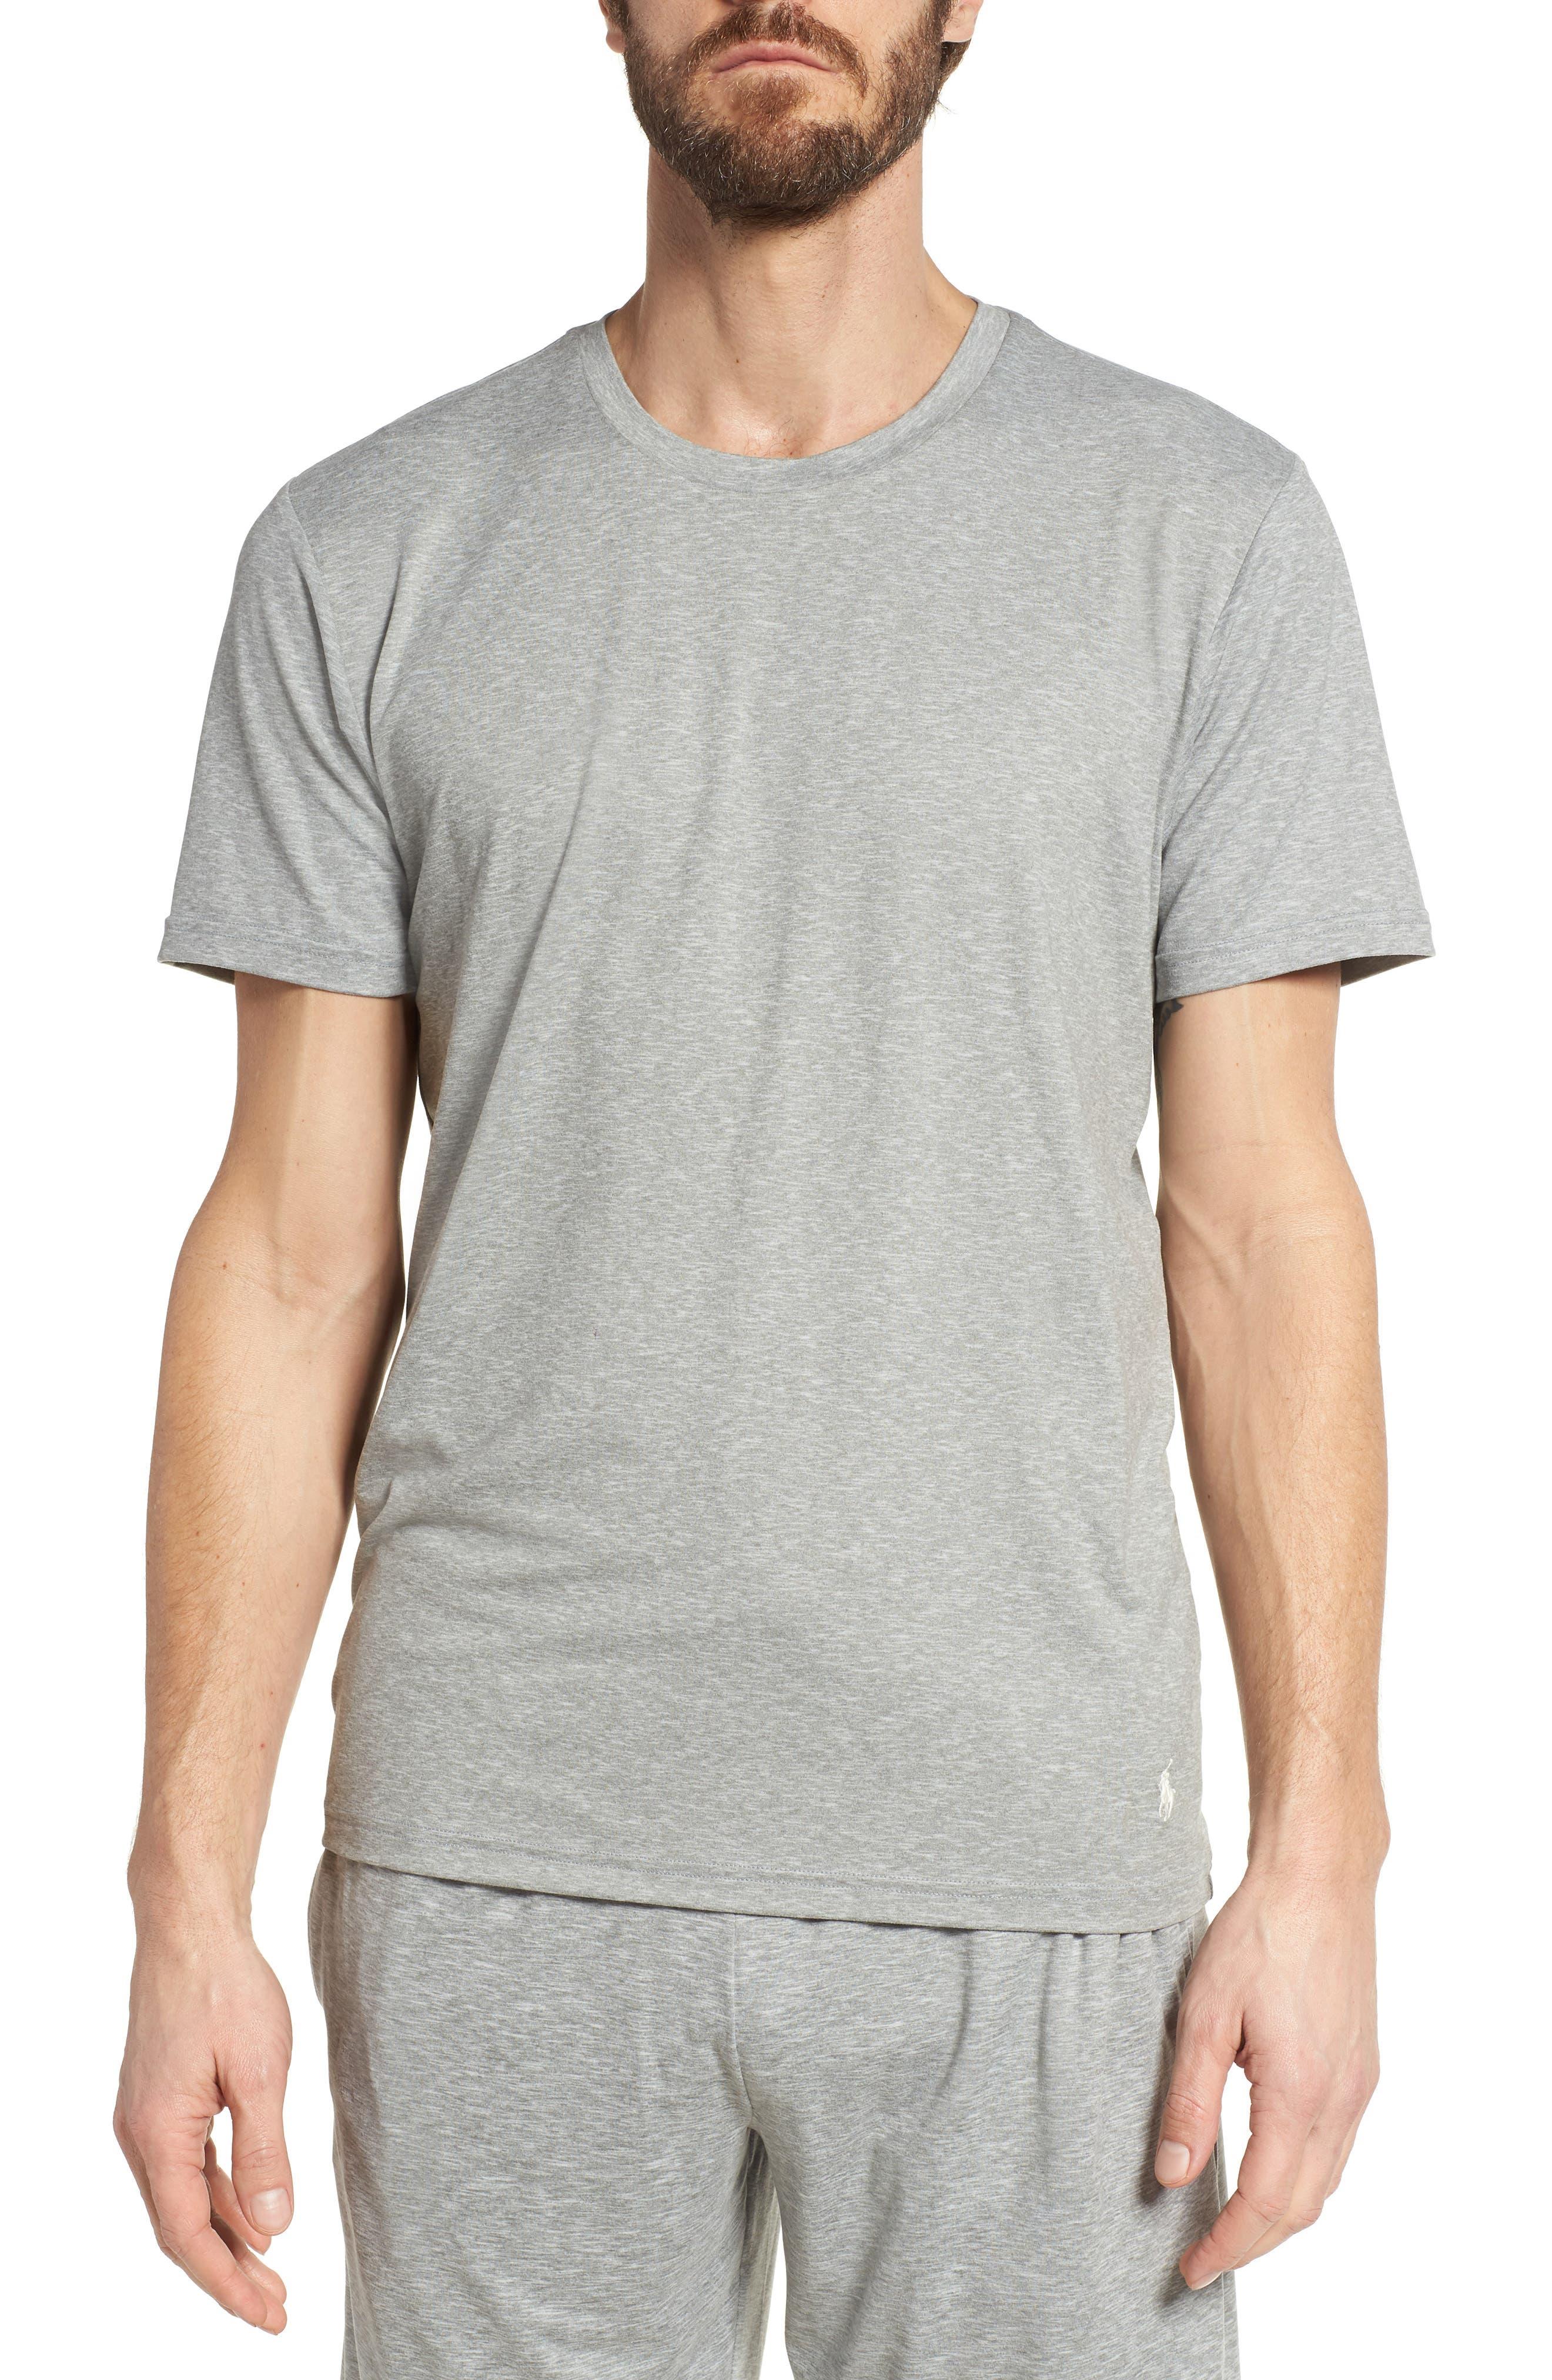 Therma Sleep Crewneck T-Shirt,                         Main,                         color, 033